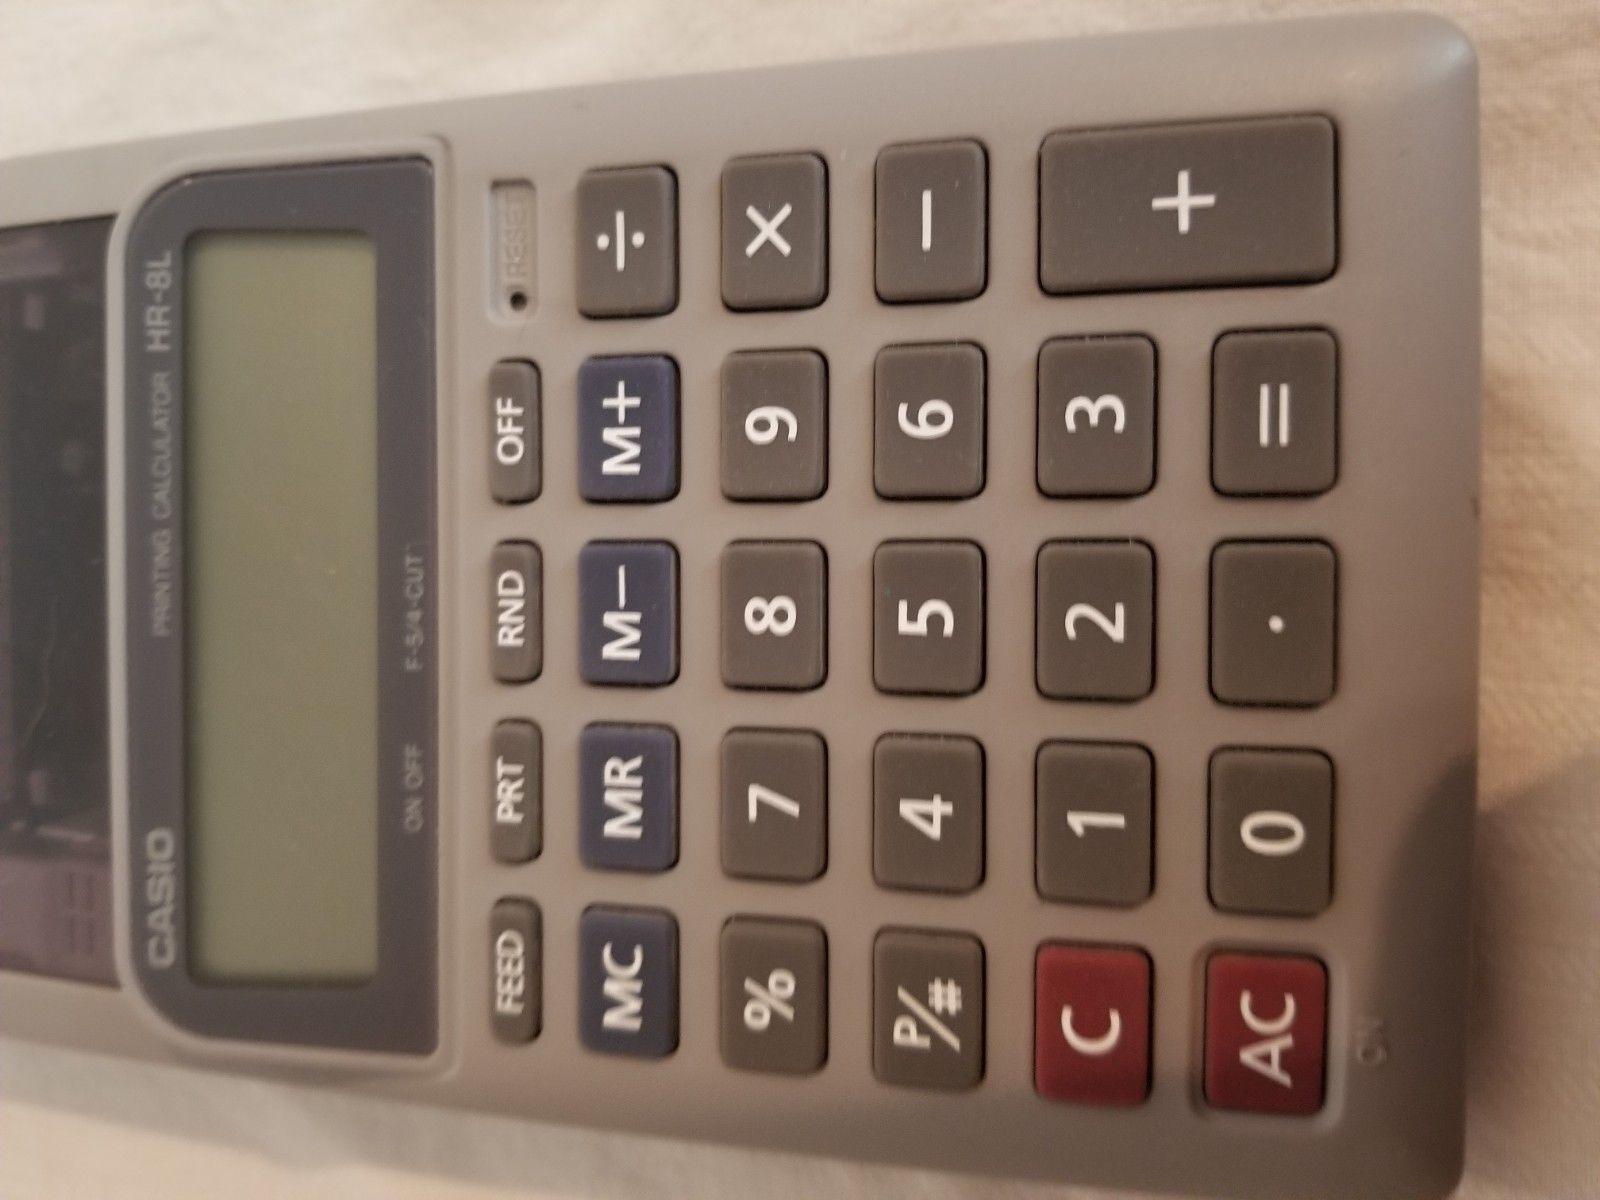 casio printing calculator image 5